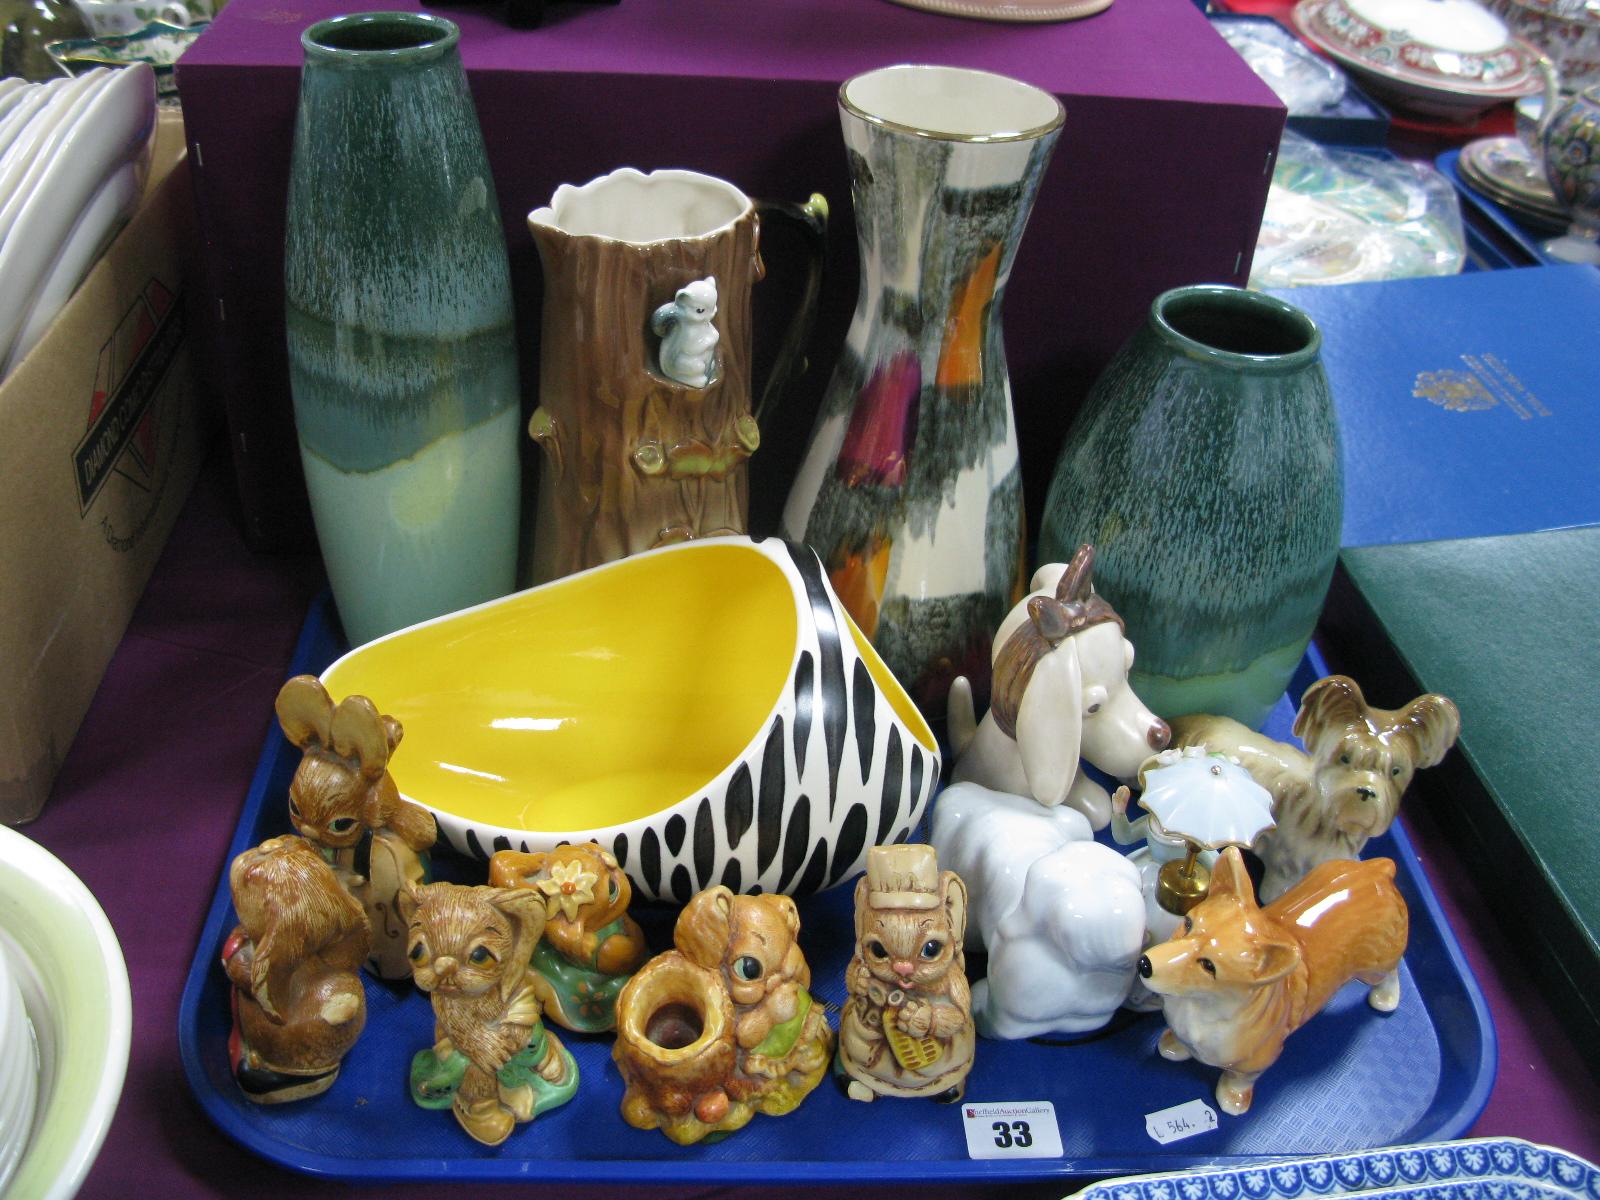 Lot 33 - Scheurich, Amano and other German Vases, Hornsea fauna jug, Beswick zebra posy, Sylvac, Pendelfin,